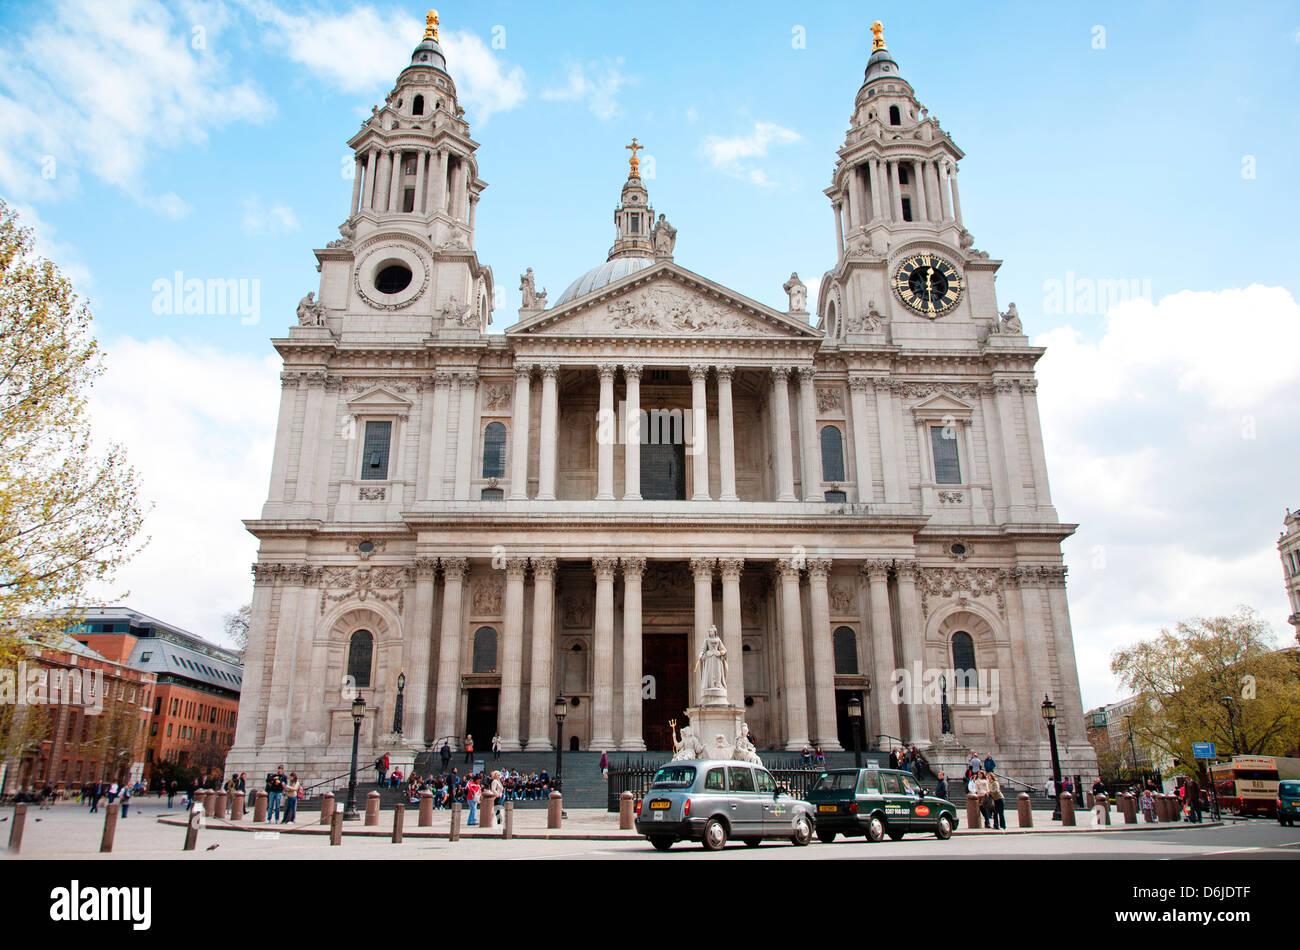 St. Pauls Cathedral Eingang, London, England, Vereinigtes Königreich, Europa Stockbild